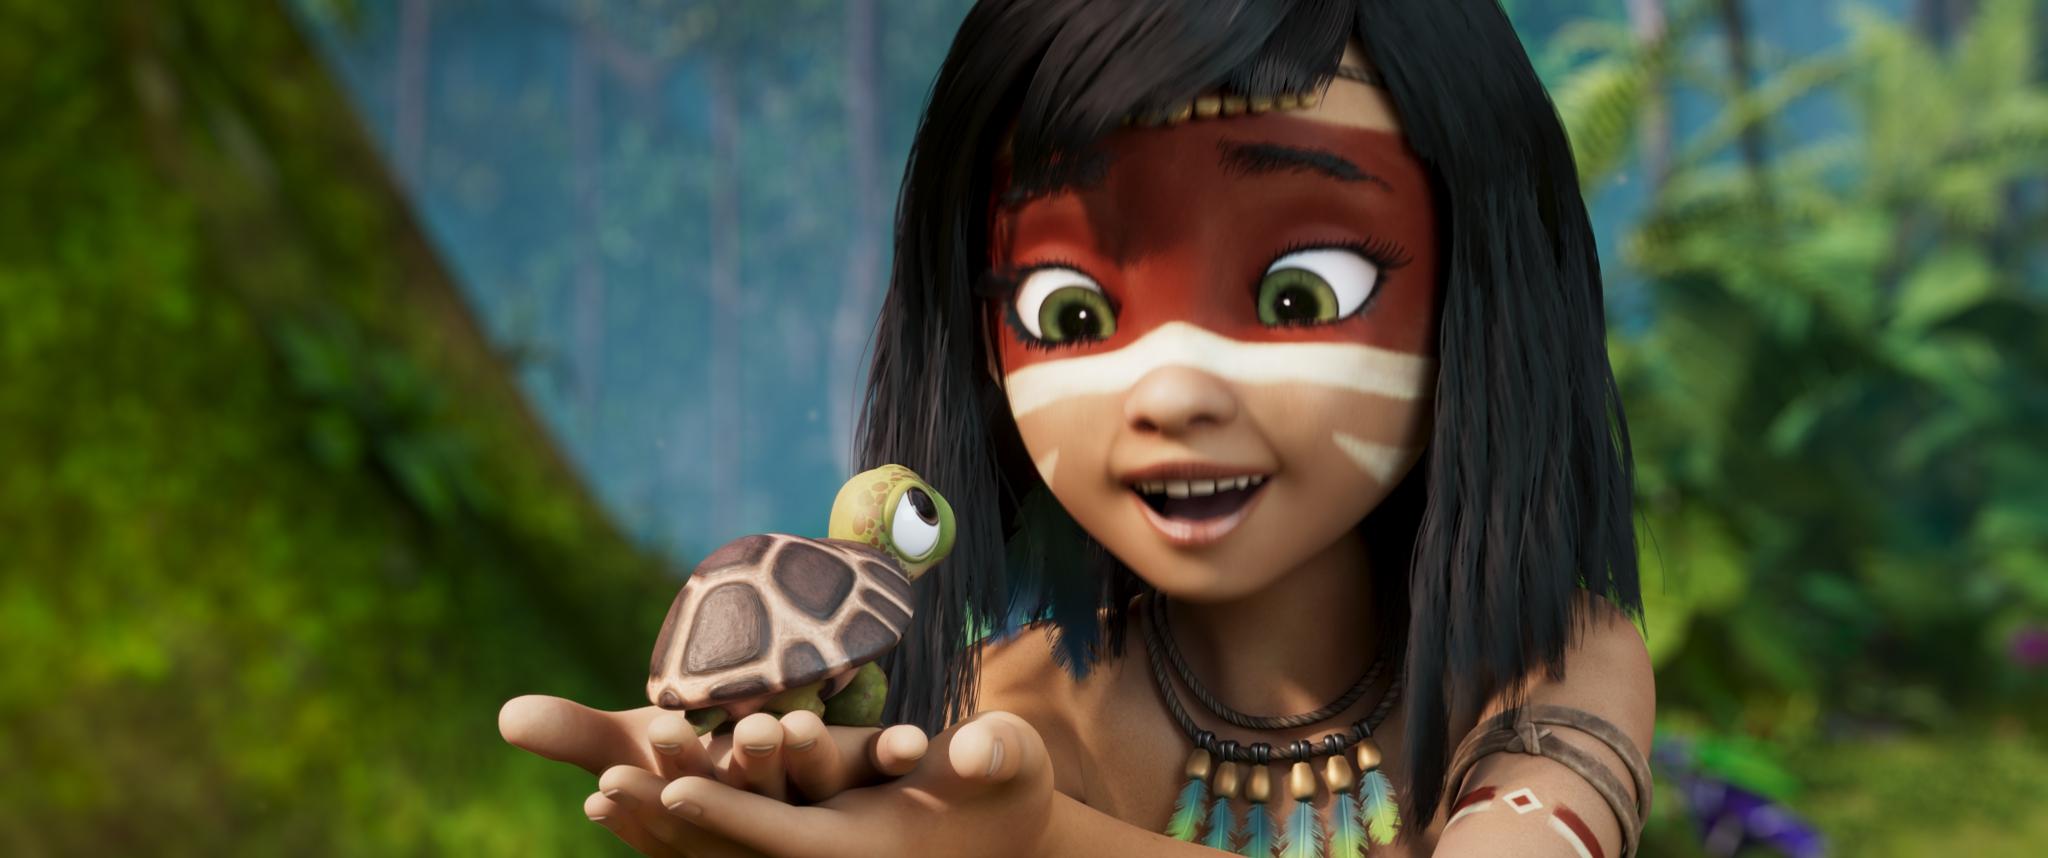 film, ainbo, princesse, amazonie